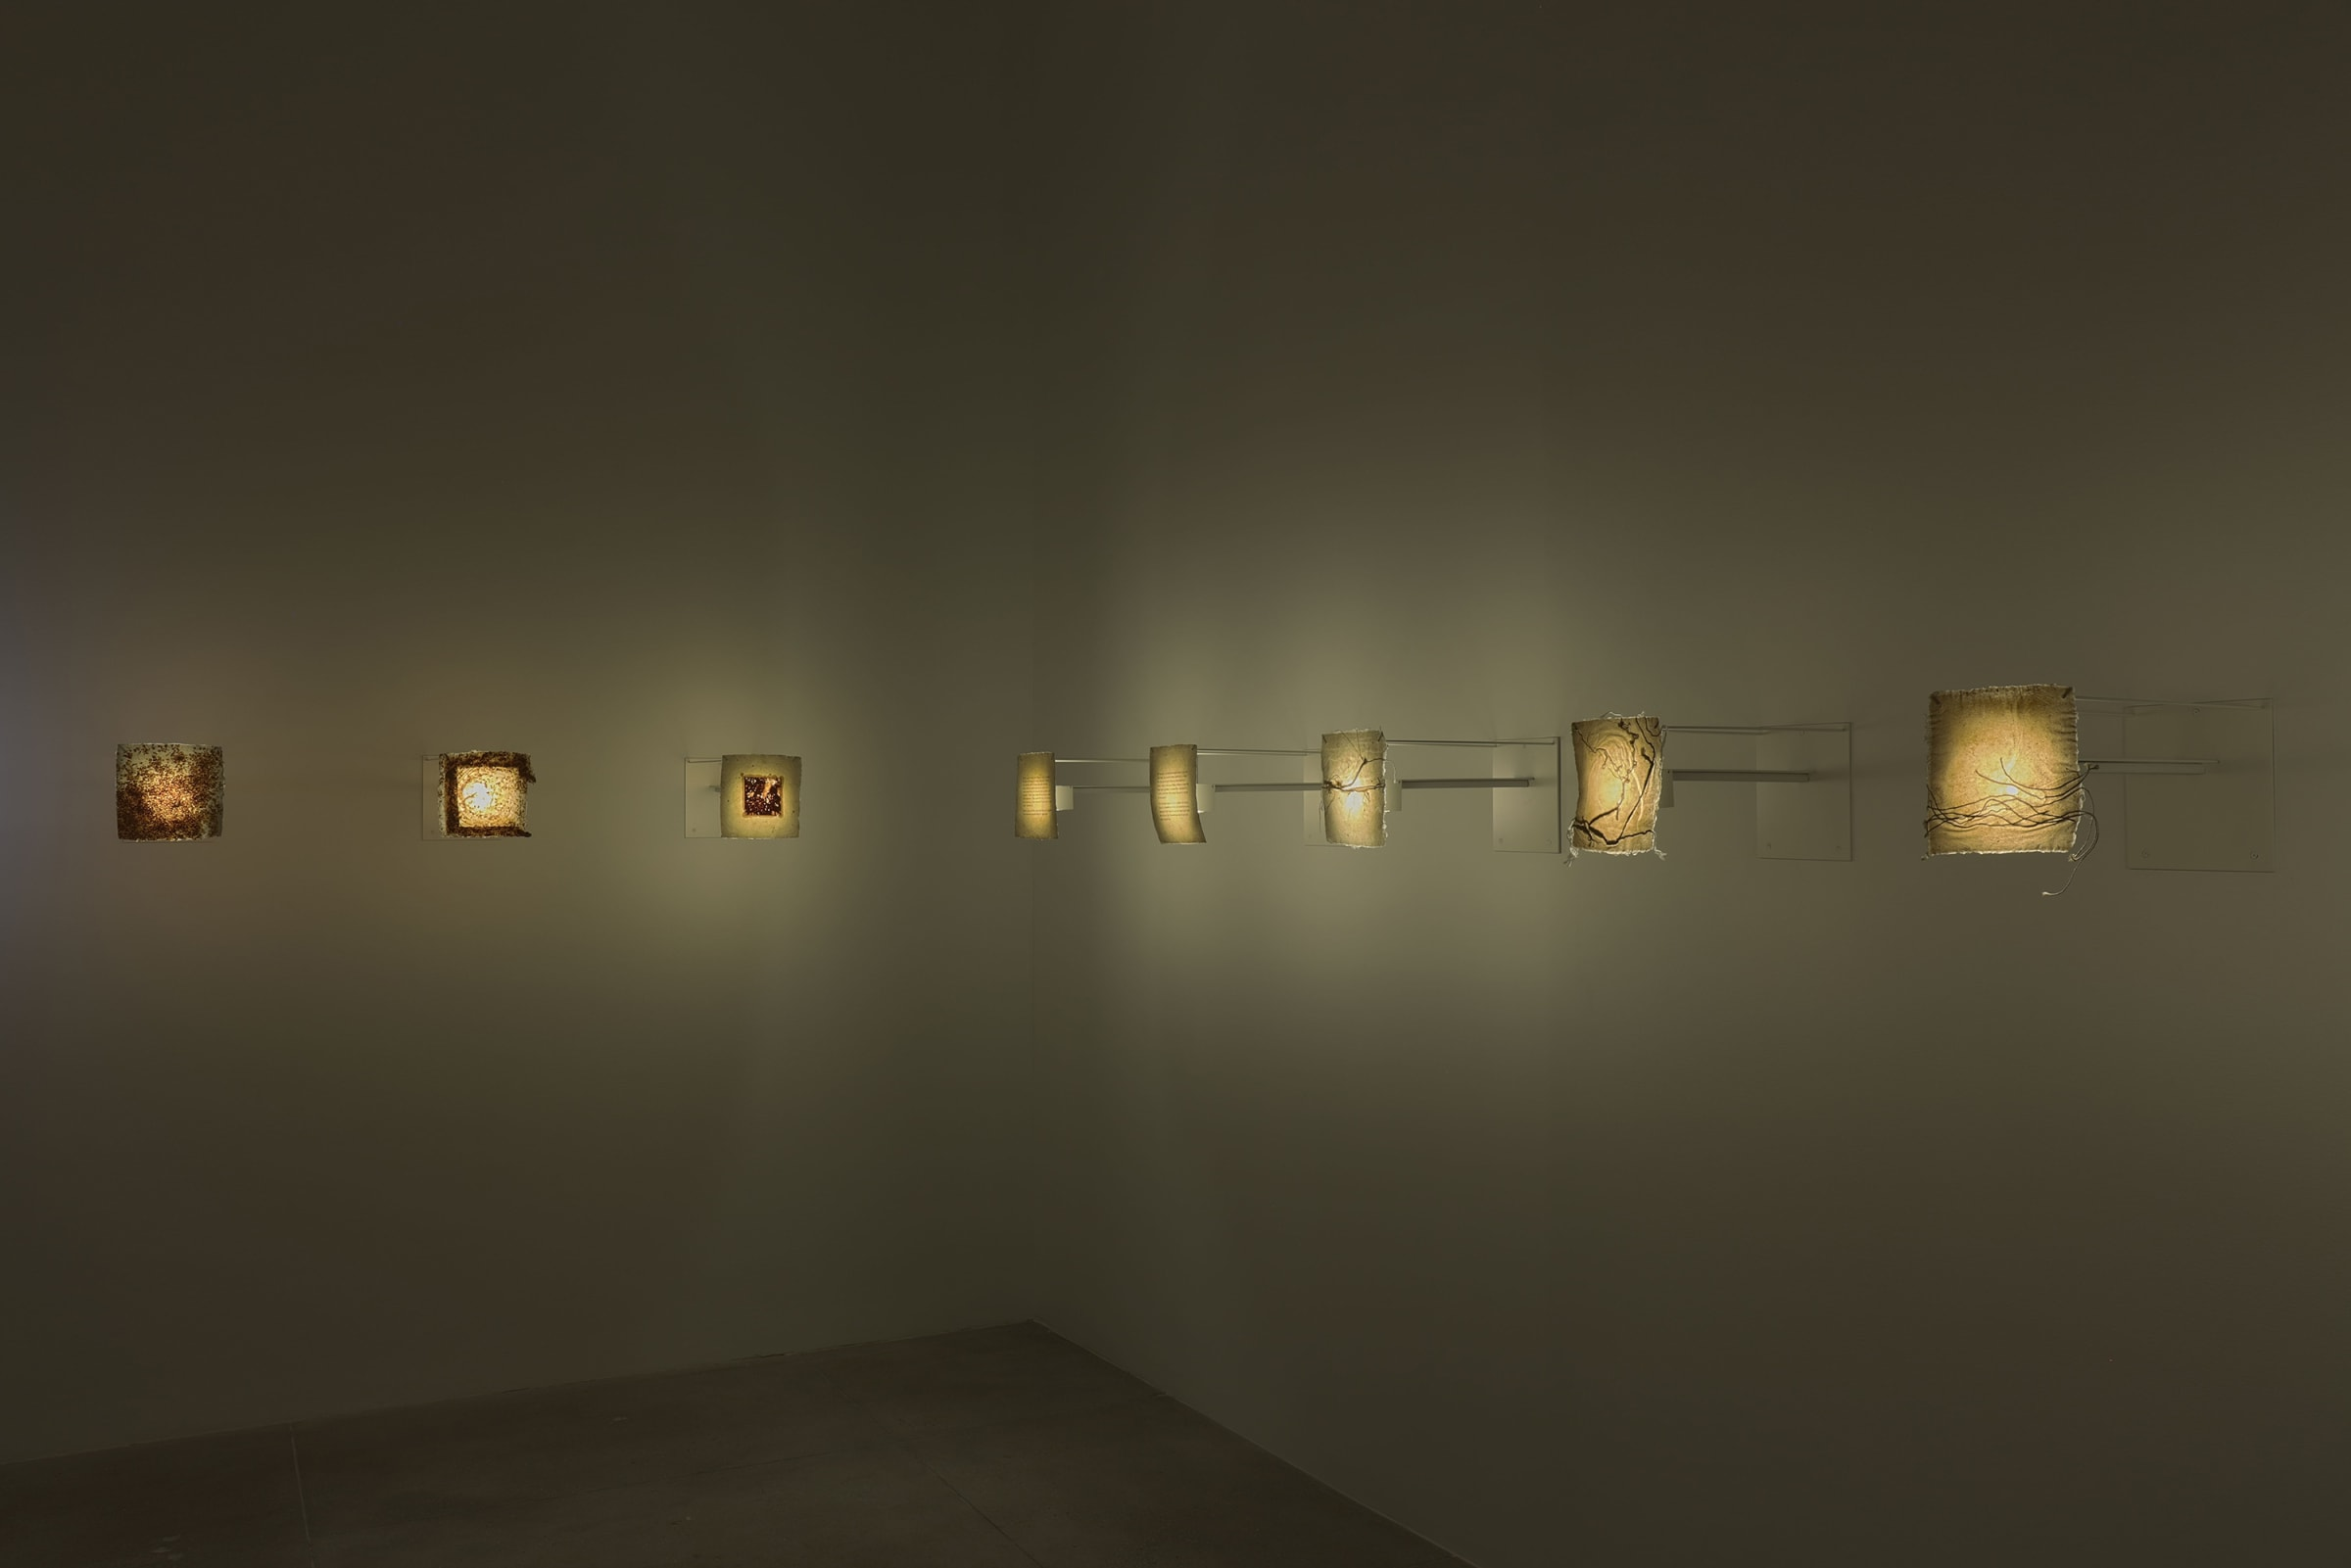 Eight small projectors behind various fabrics warmly illuminate a dimly lit room.